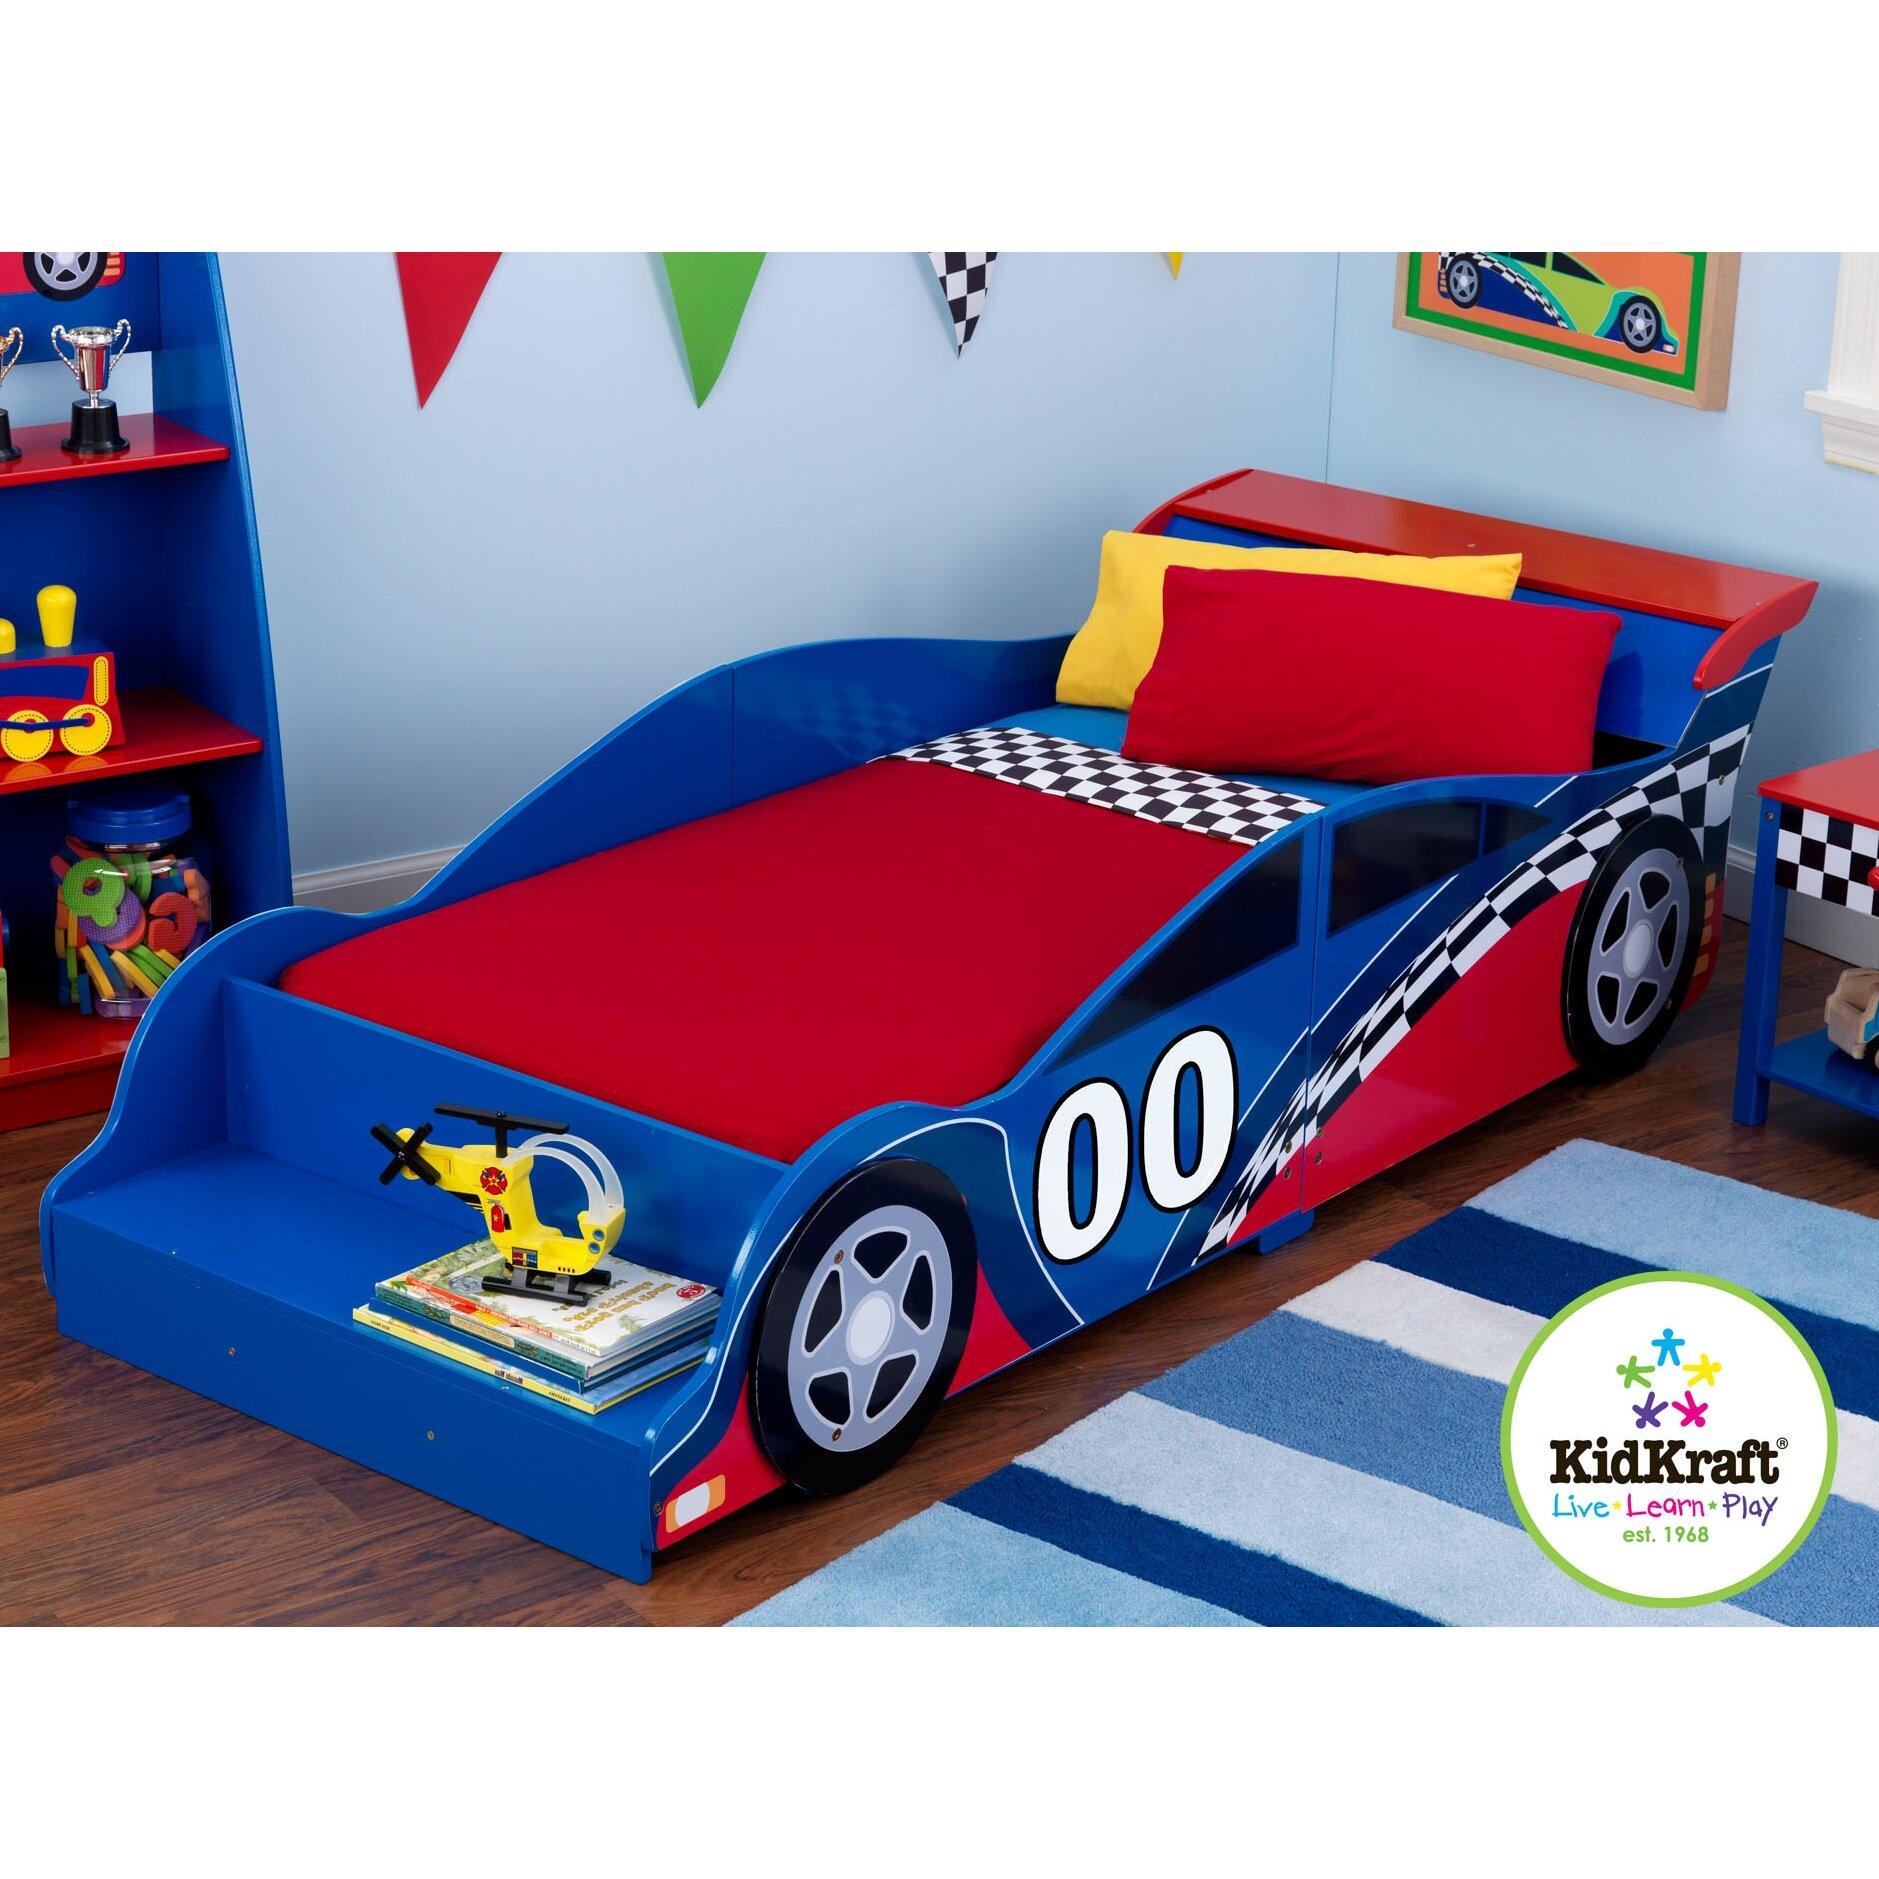 Car beds for boys twin - Racecar Toddler Car Bed